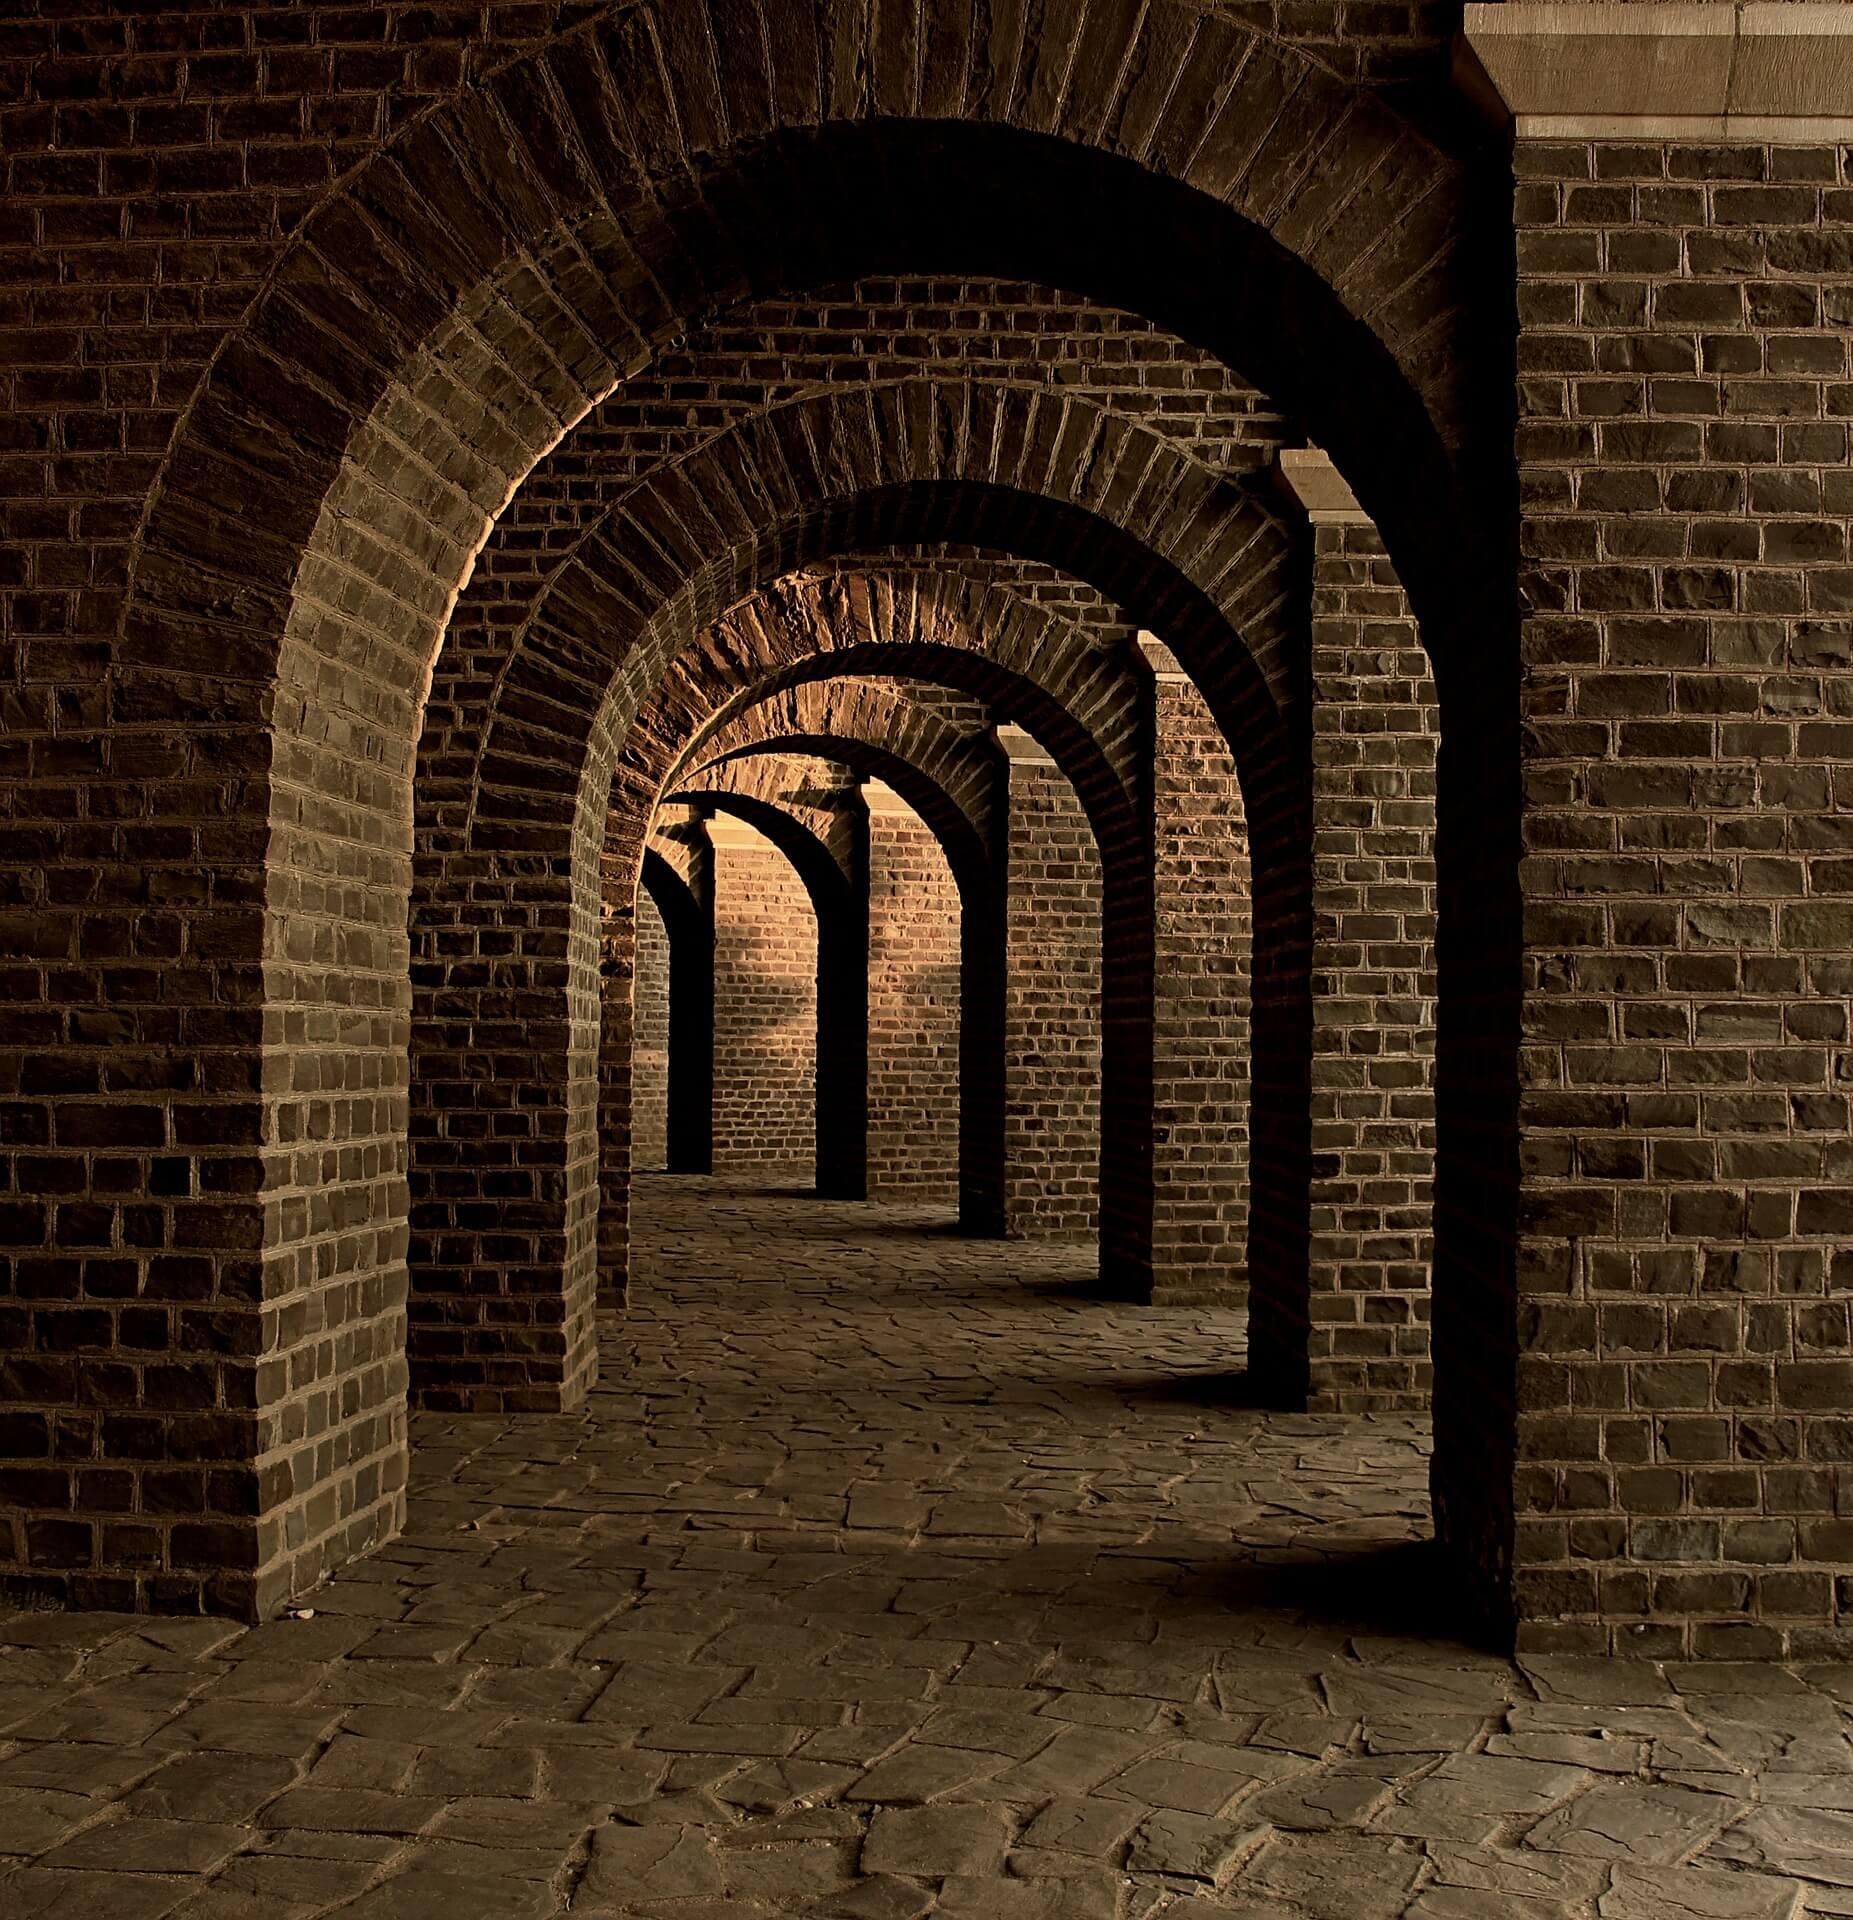 vaulted-cellar-258906_1920 (1).jpg